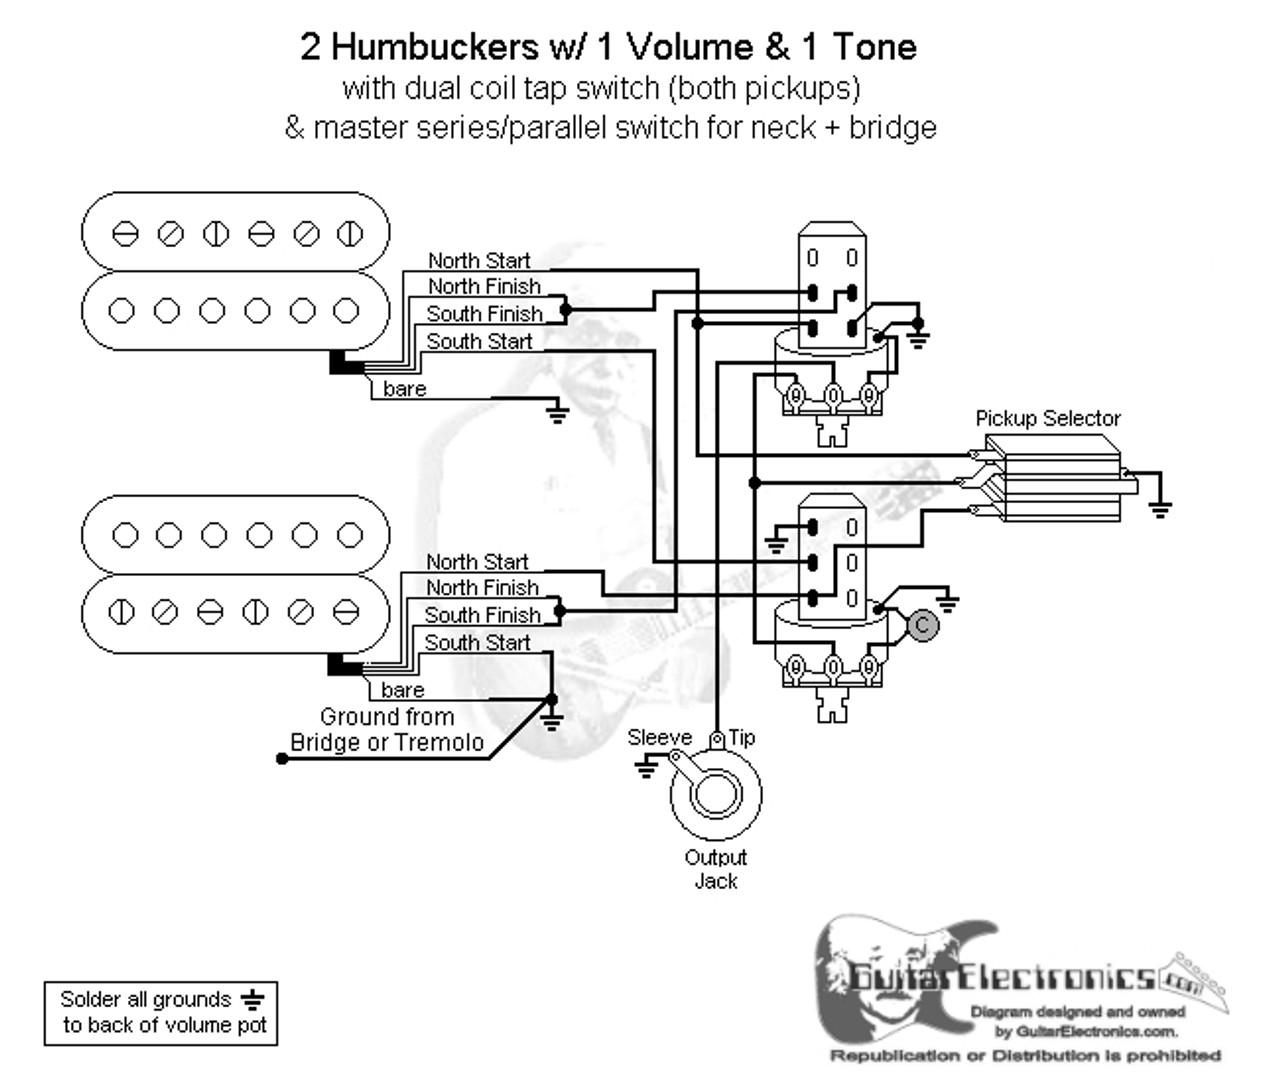 medium resolution of 2 hbs 3 way toggle 1 vol 1 tone coil tap series parallel 2 humbucker 1 vol 1 wiring diagrams